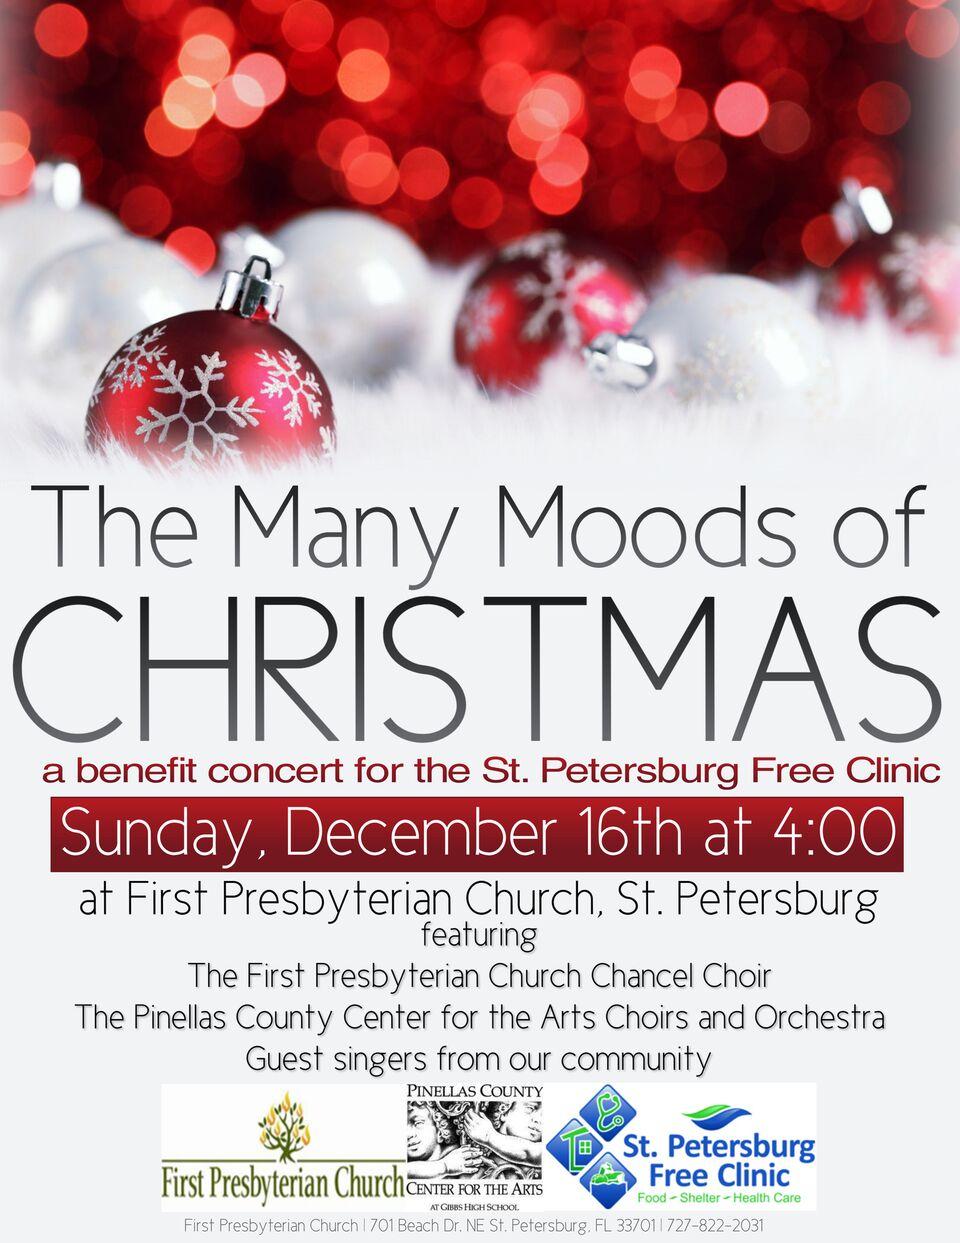 FPC Many Moods of Christmas flyer.jpg